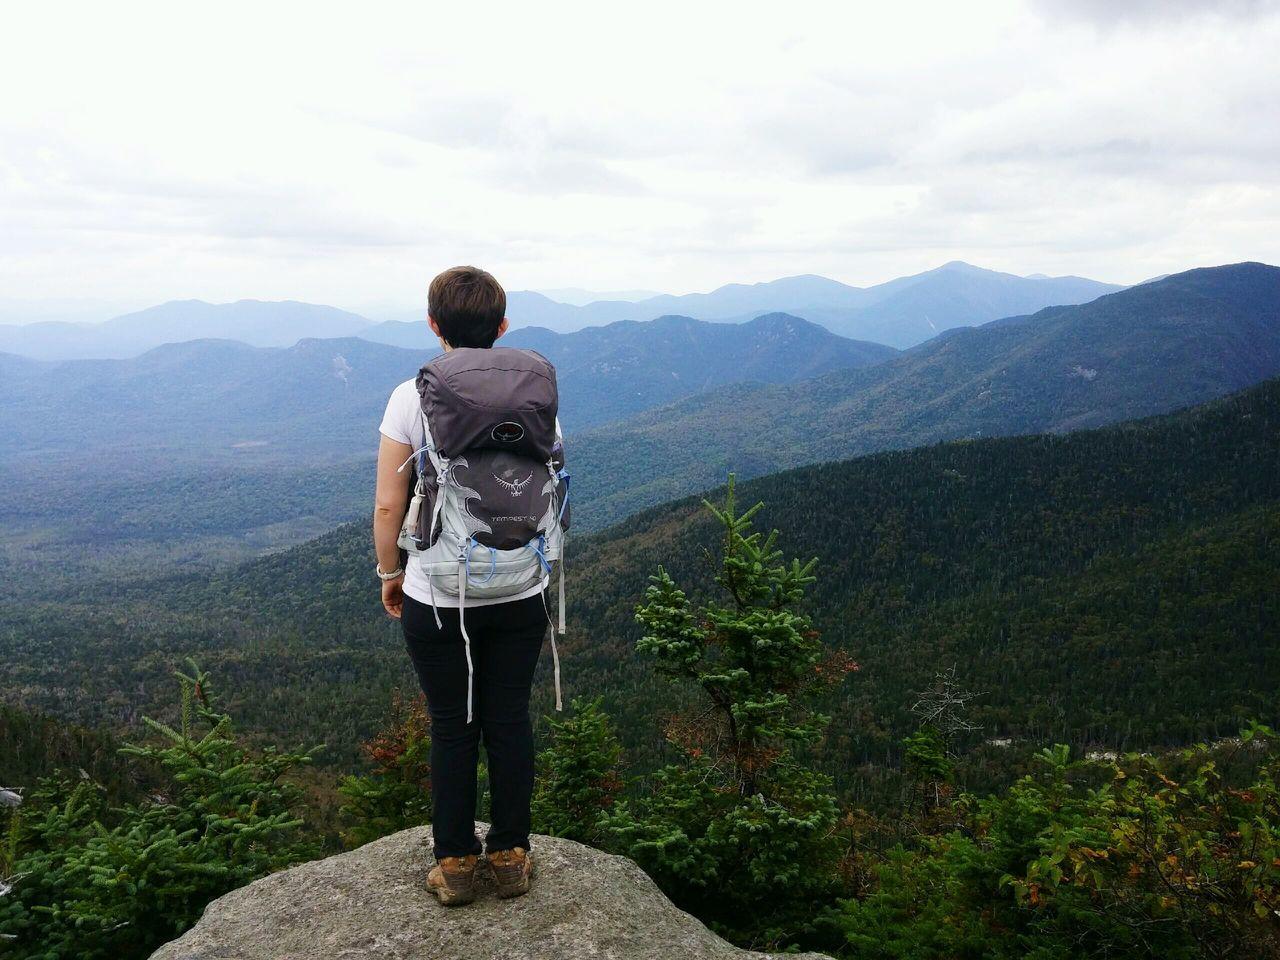 View from Hough Peak ADK Highpeak Adklife Beautiful Nature Explore Female Hiker Backpacking Ilovenewyork Upstateny Mountainsarecalling Adrenaline Junkie